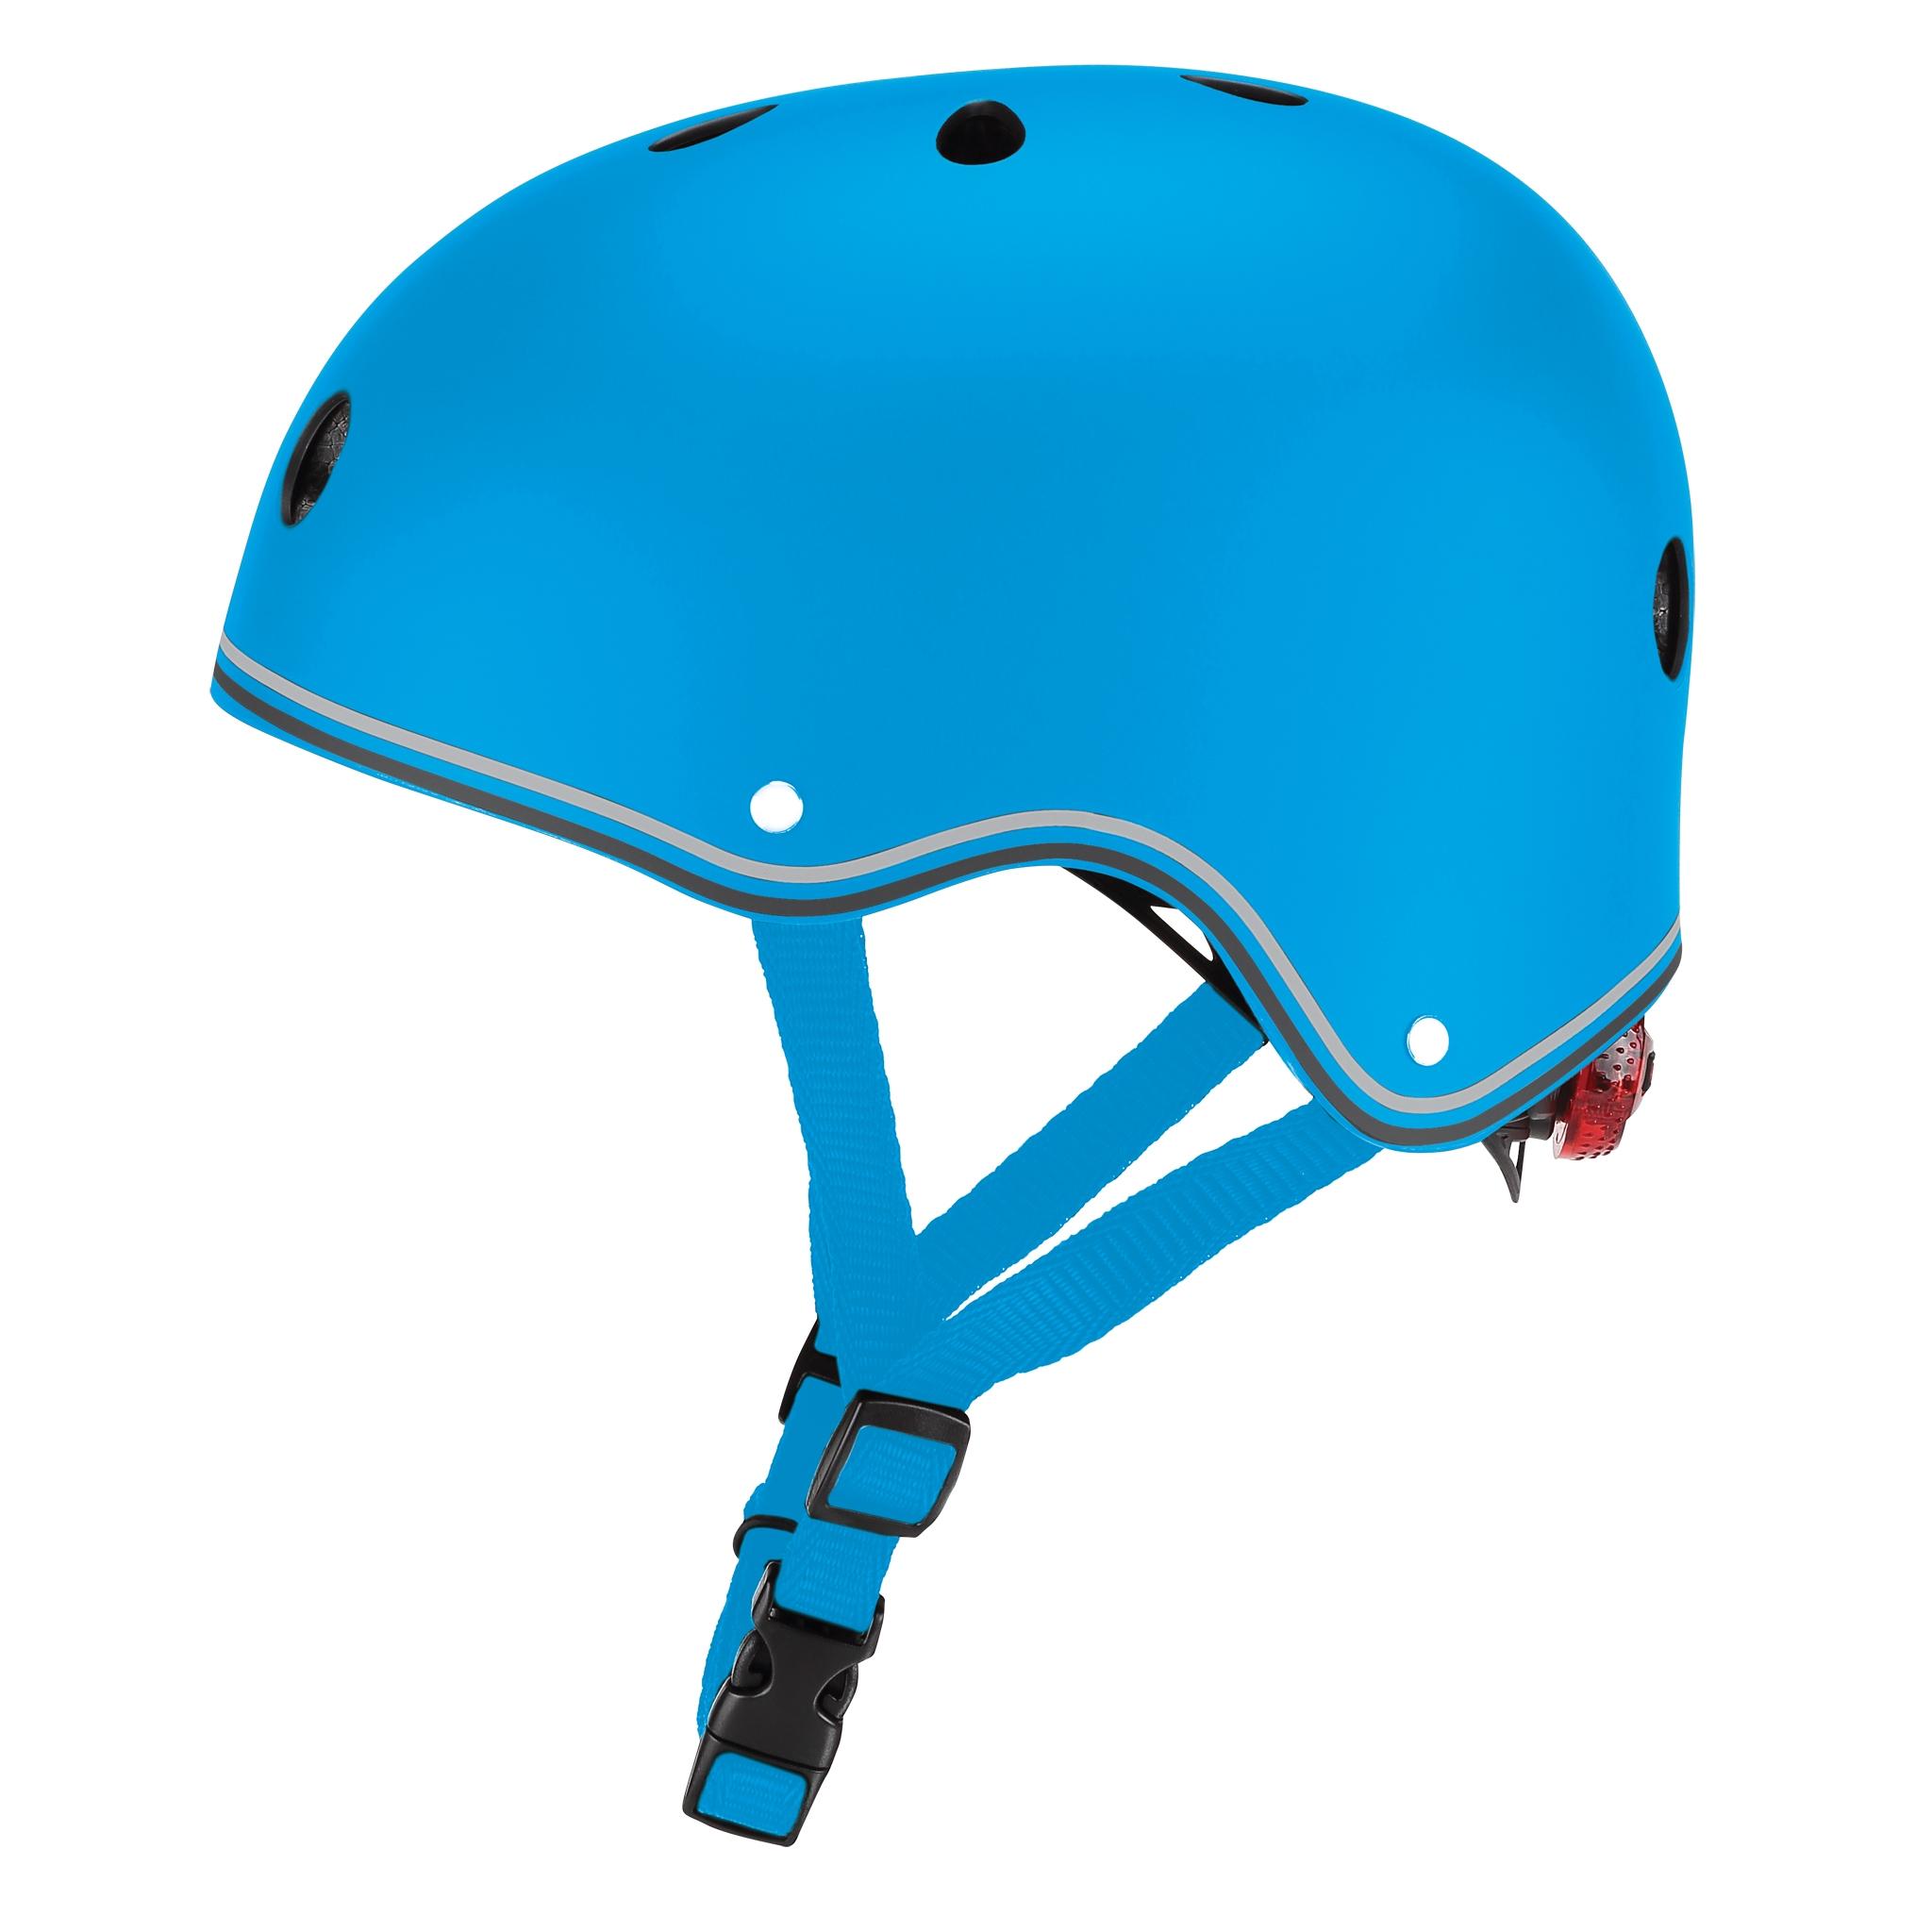 PRIMO-helmets-scooter-helmets-for-kids-with-adjustable-helmet-knob-sky-blue 3